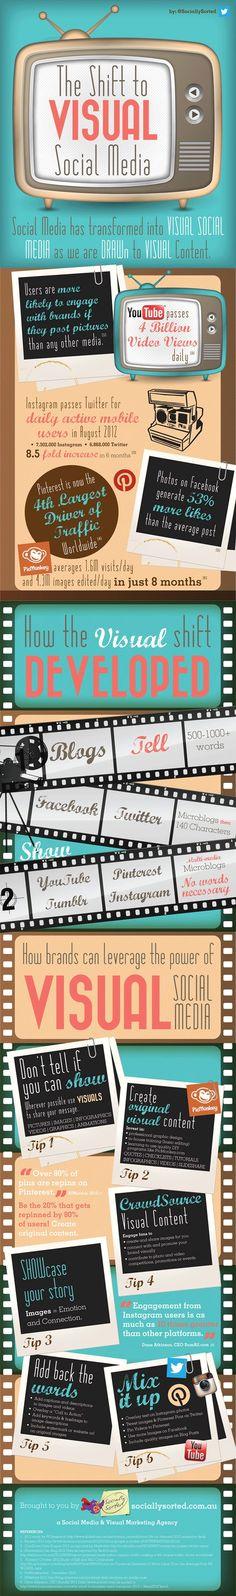 The Visual Evolution of Social Media (infographic) Marketing Mail, Marketing Visual, Marketing Trends, Marketing Services, Inbound Marketing, Content Marketing, Internet Marketing, Online Marketing, Social Media Marketing